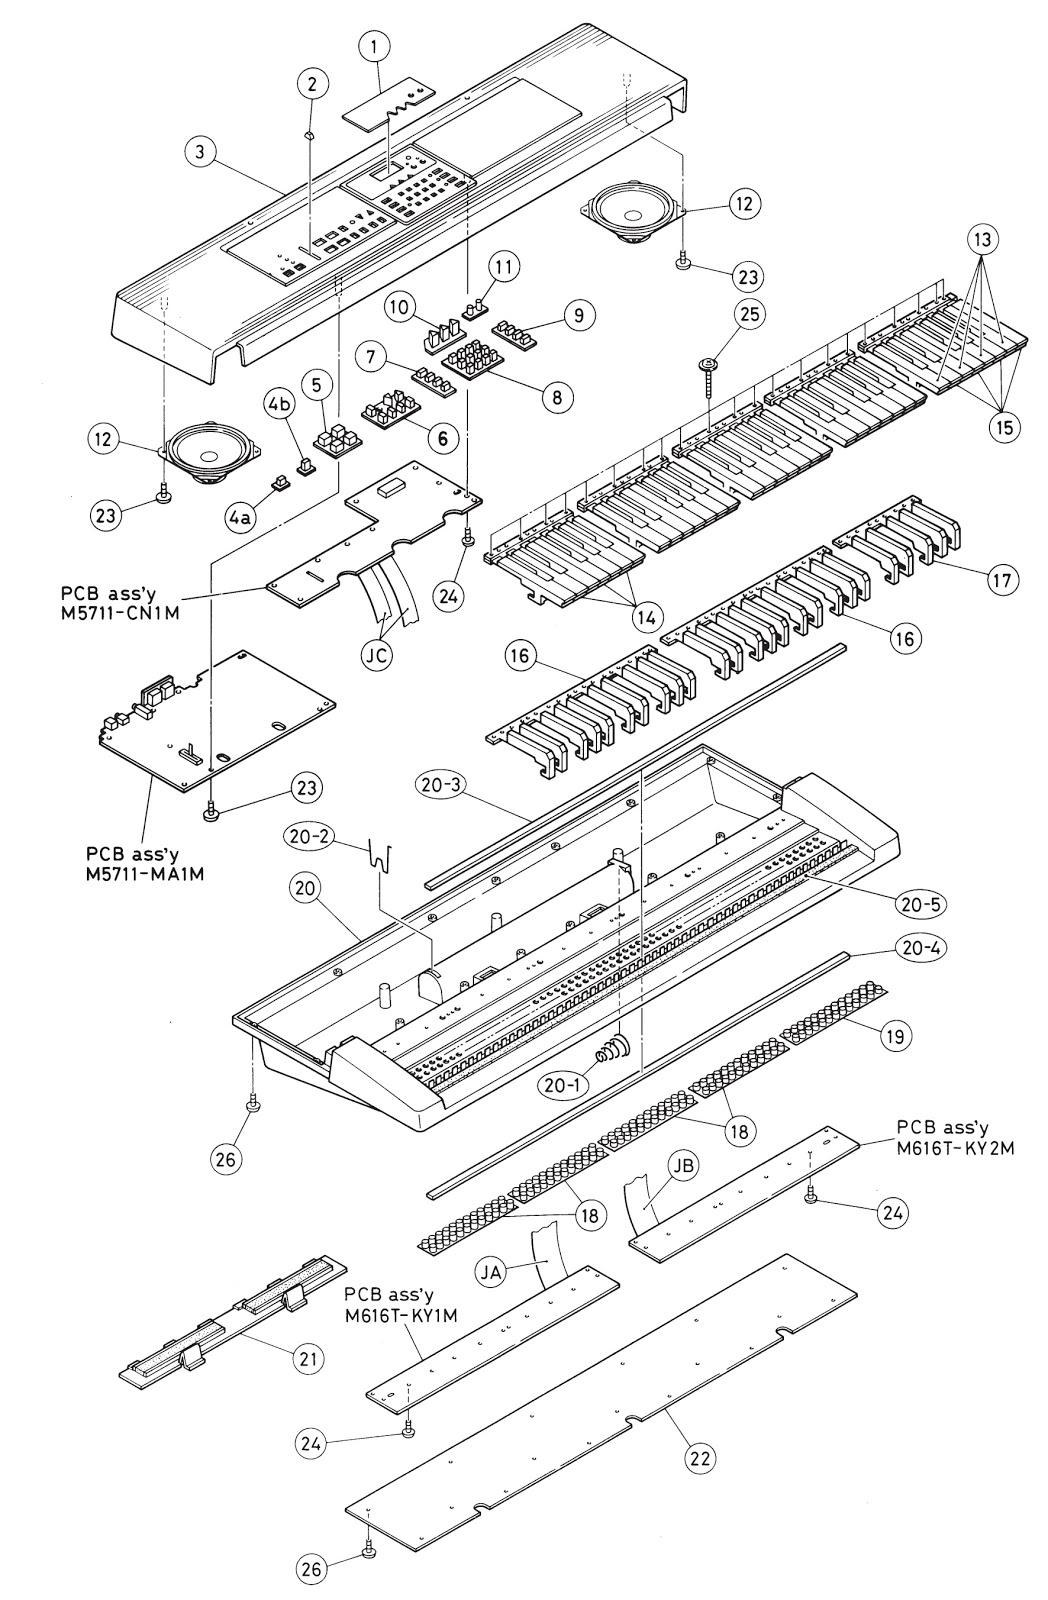 Electrotechnician Casio Ctk 650 Electronic Keyboard